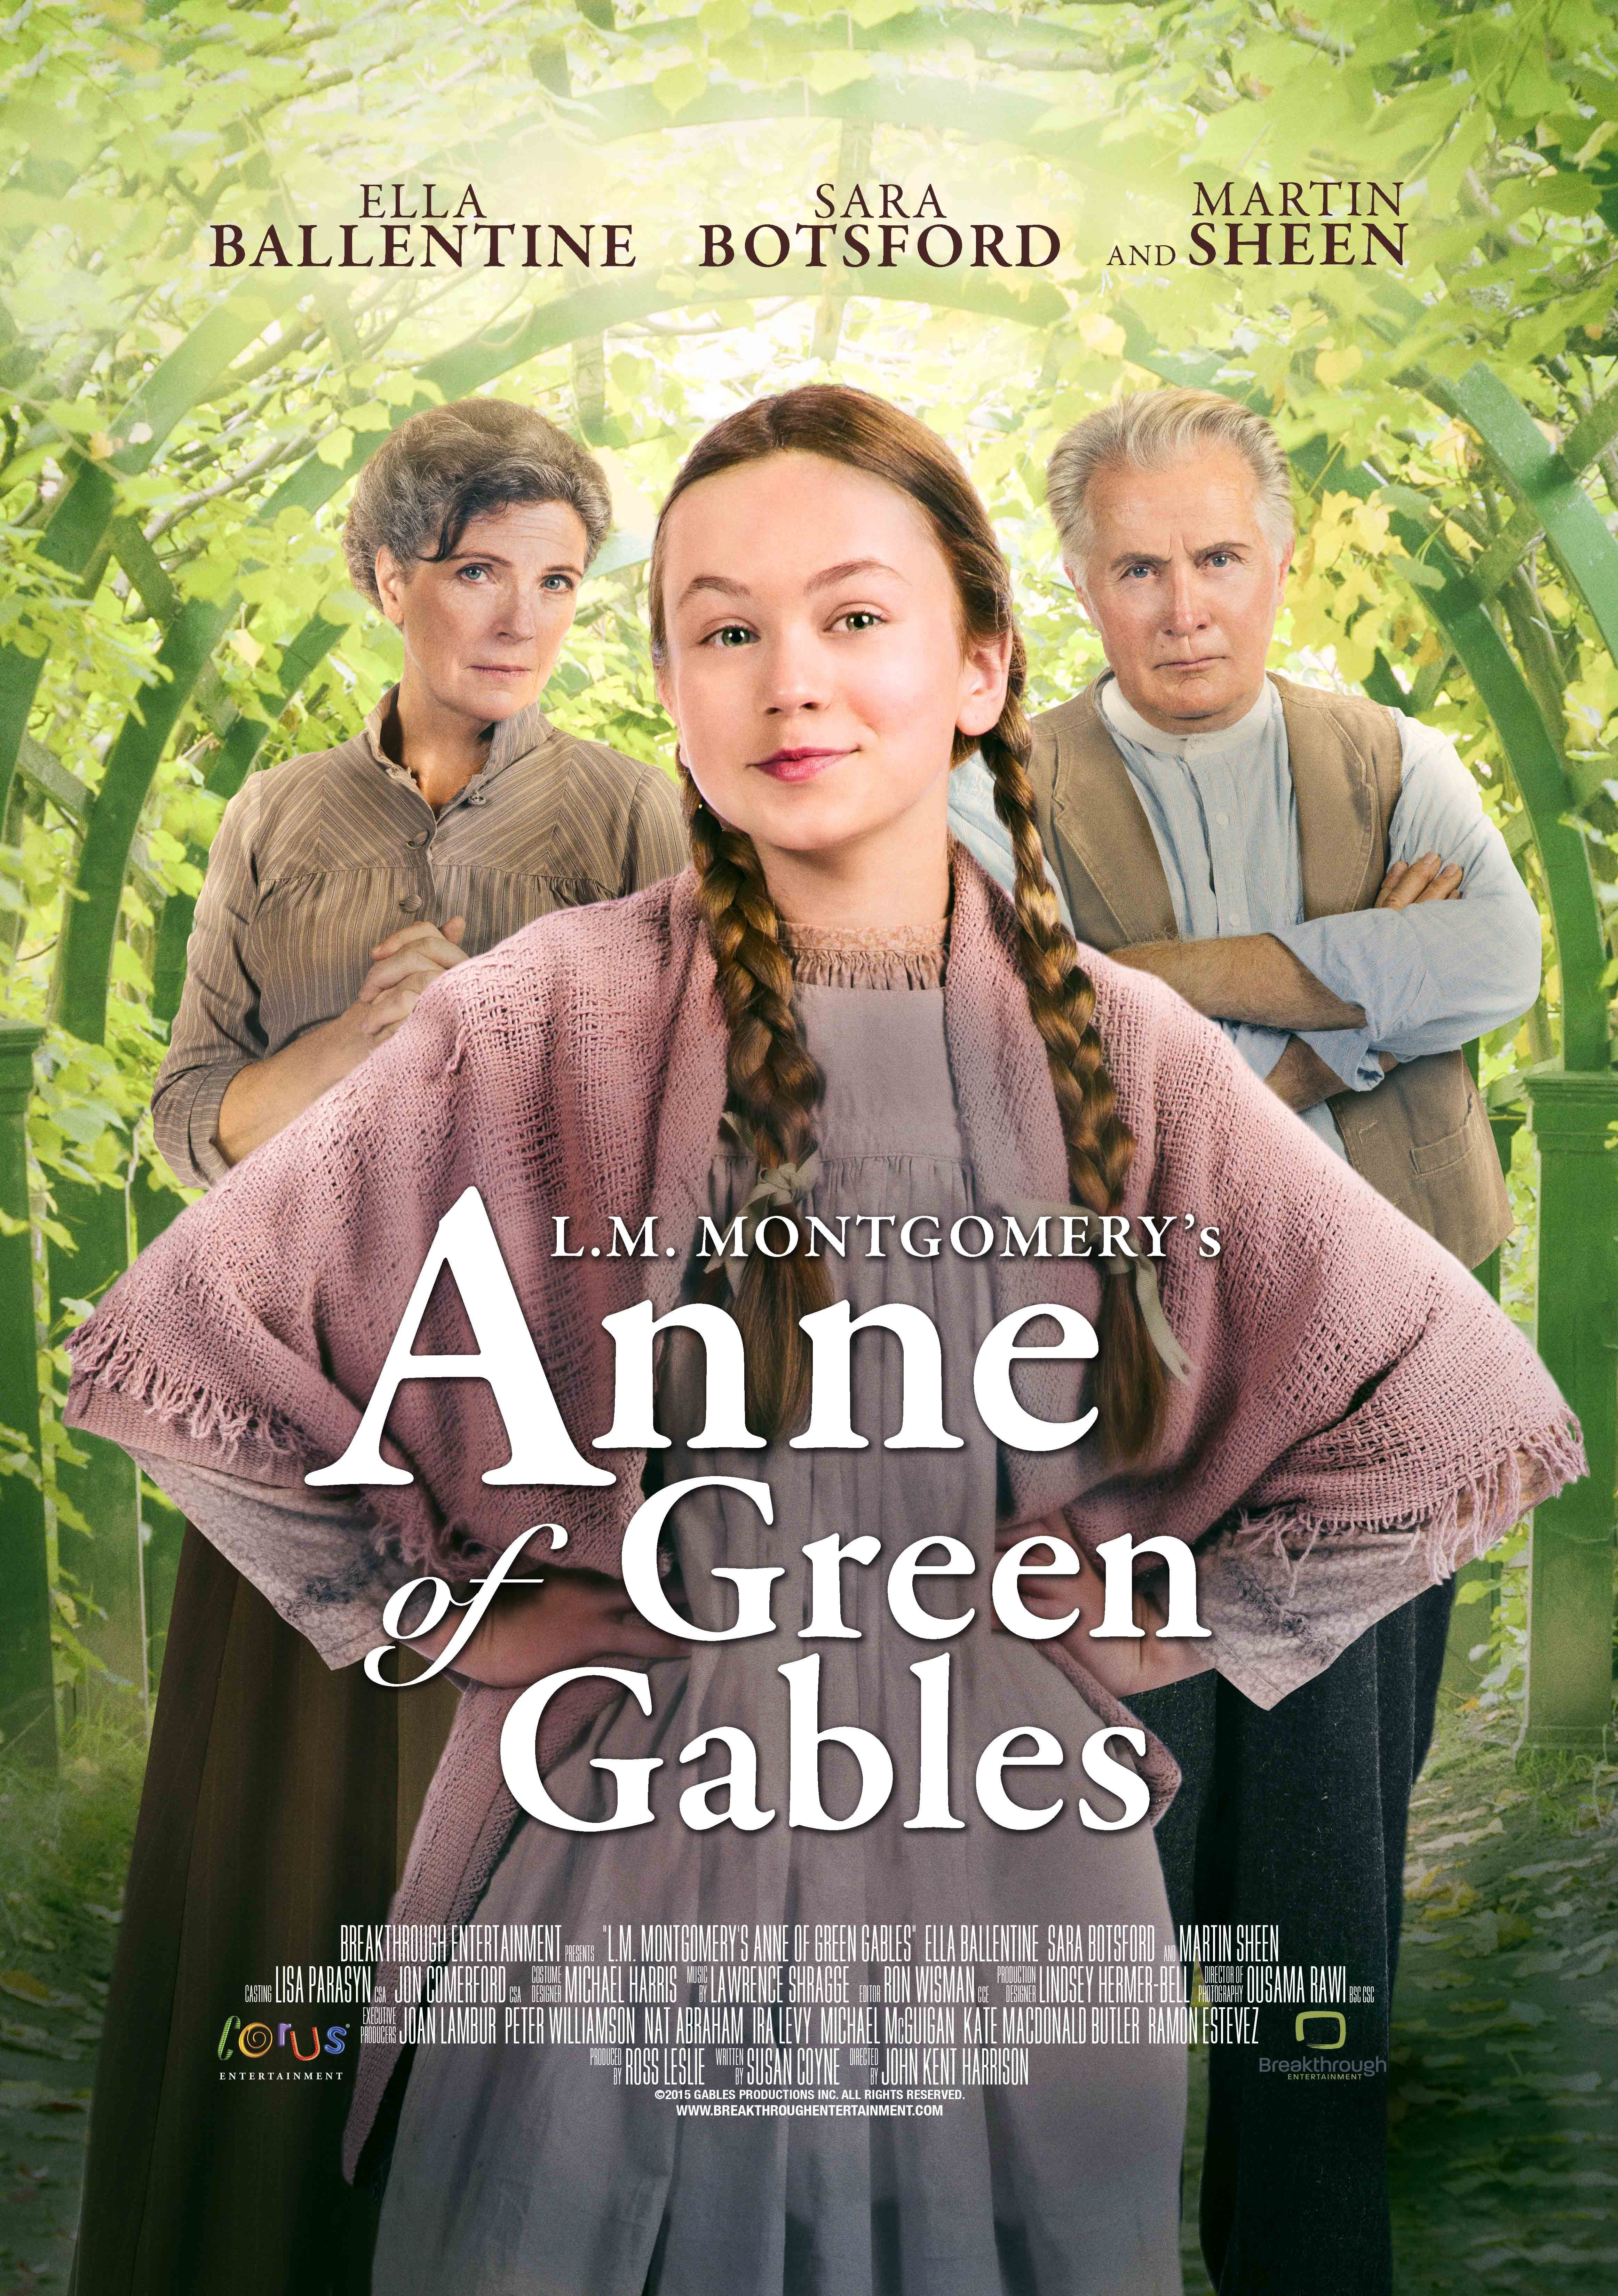 175757ee7 Anne of Green Gables (TV Movie 2016) - IMDb